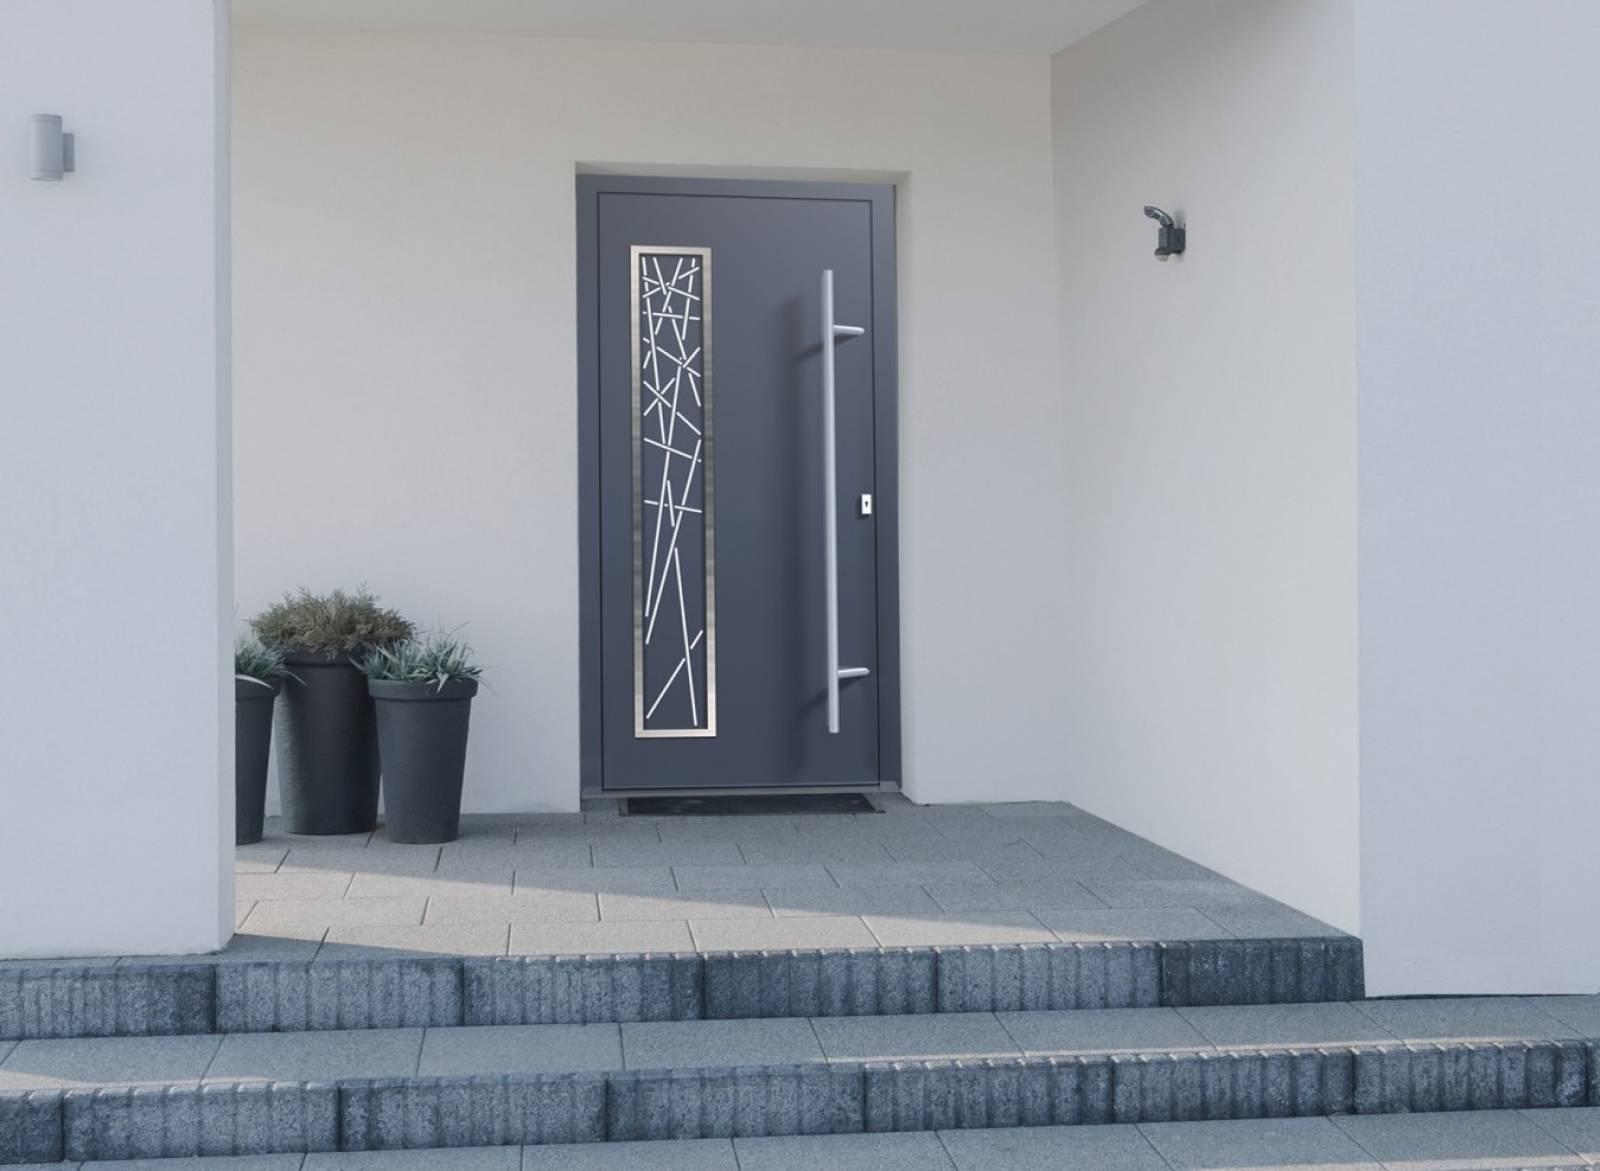 Pose porte d entr e sur mesure aubagne entreprise de for Pose porte entree